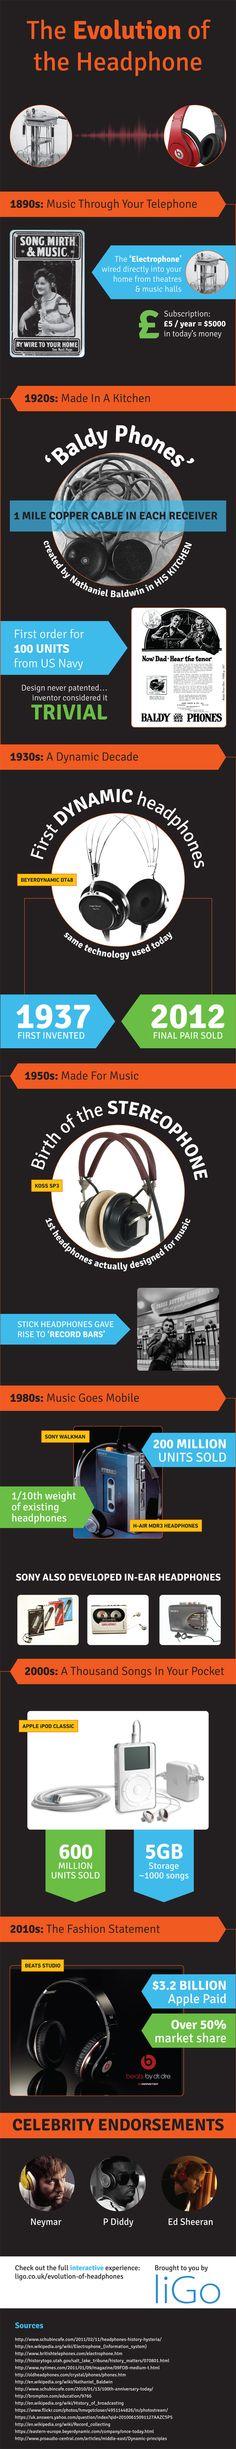 The Evolution of the Headphone #infographic #Headphone #History